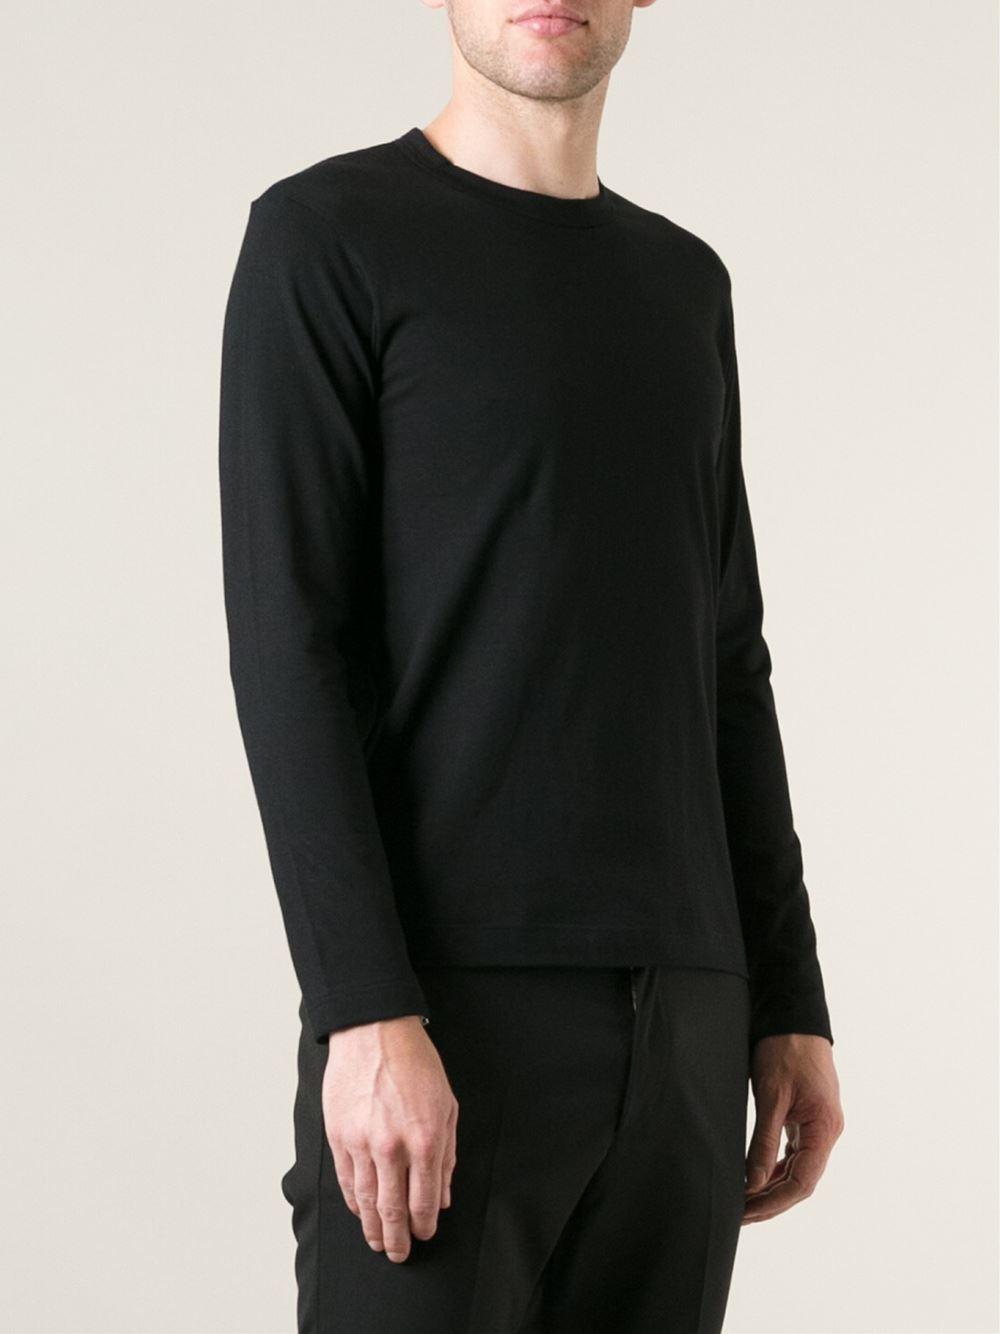 J Crew Elbow Patch Sweater